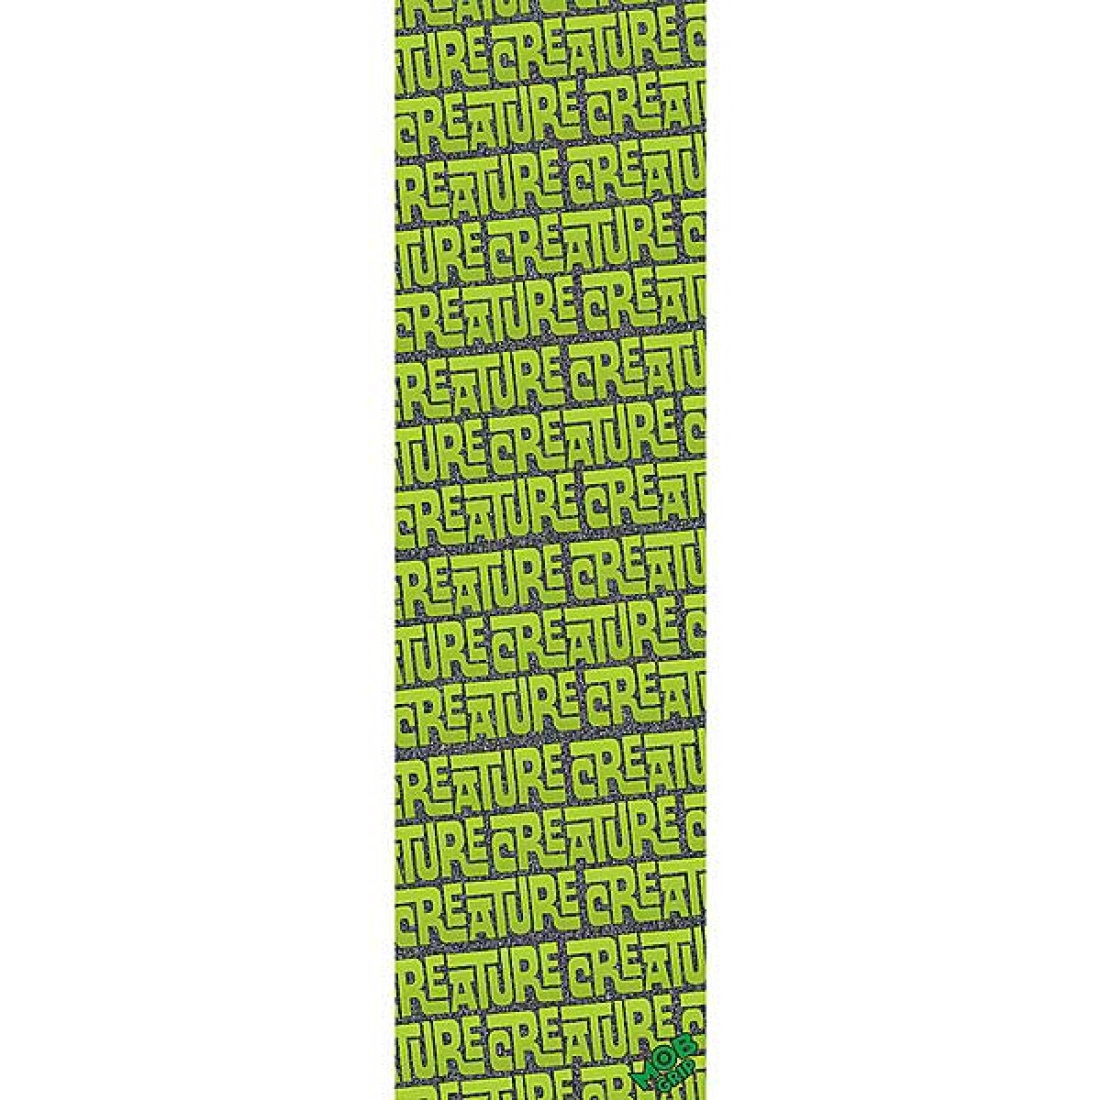 MOB-Creature Skatehoarde Font Grip Tape